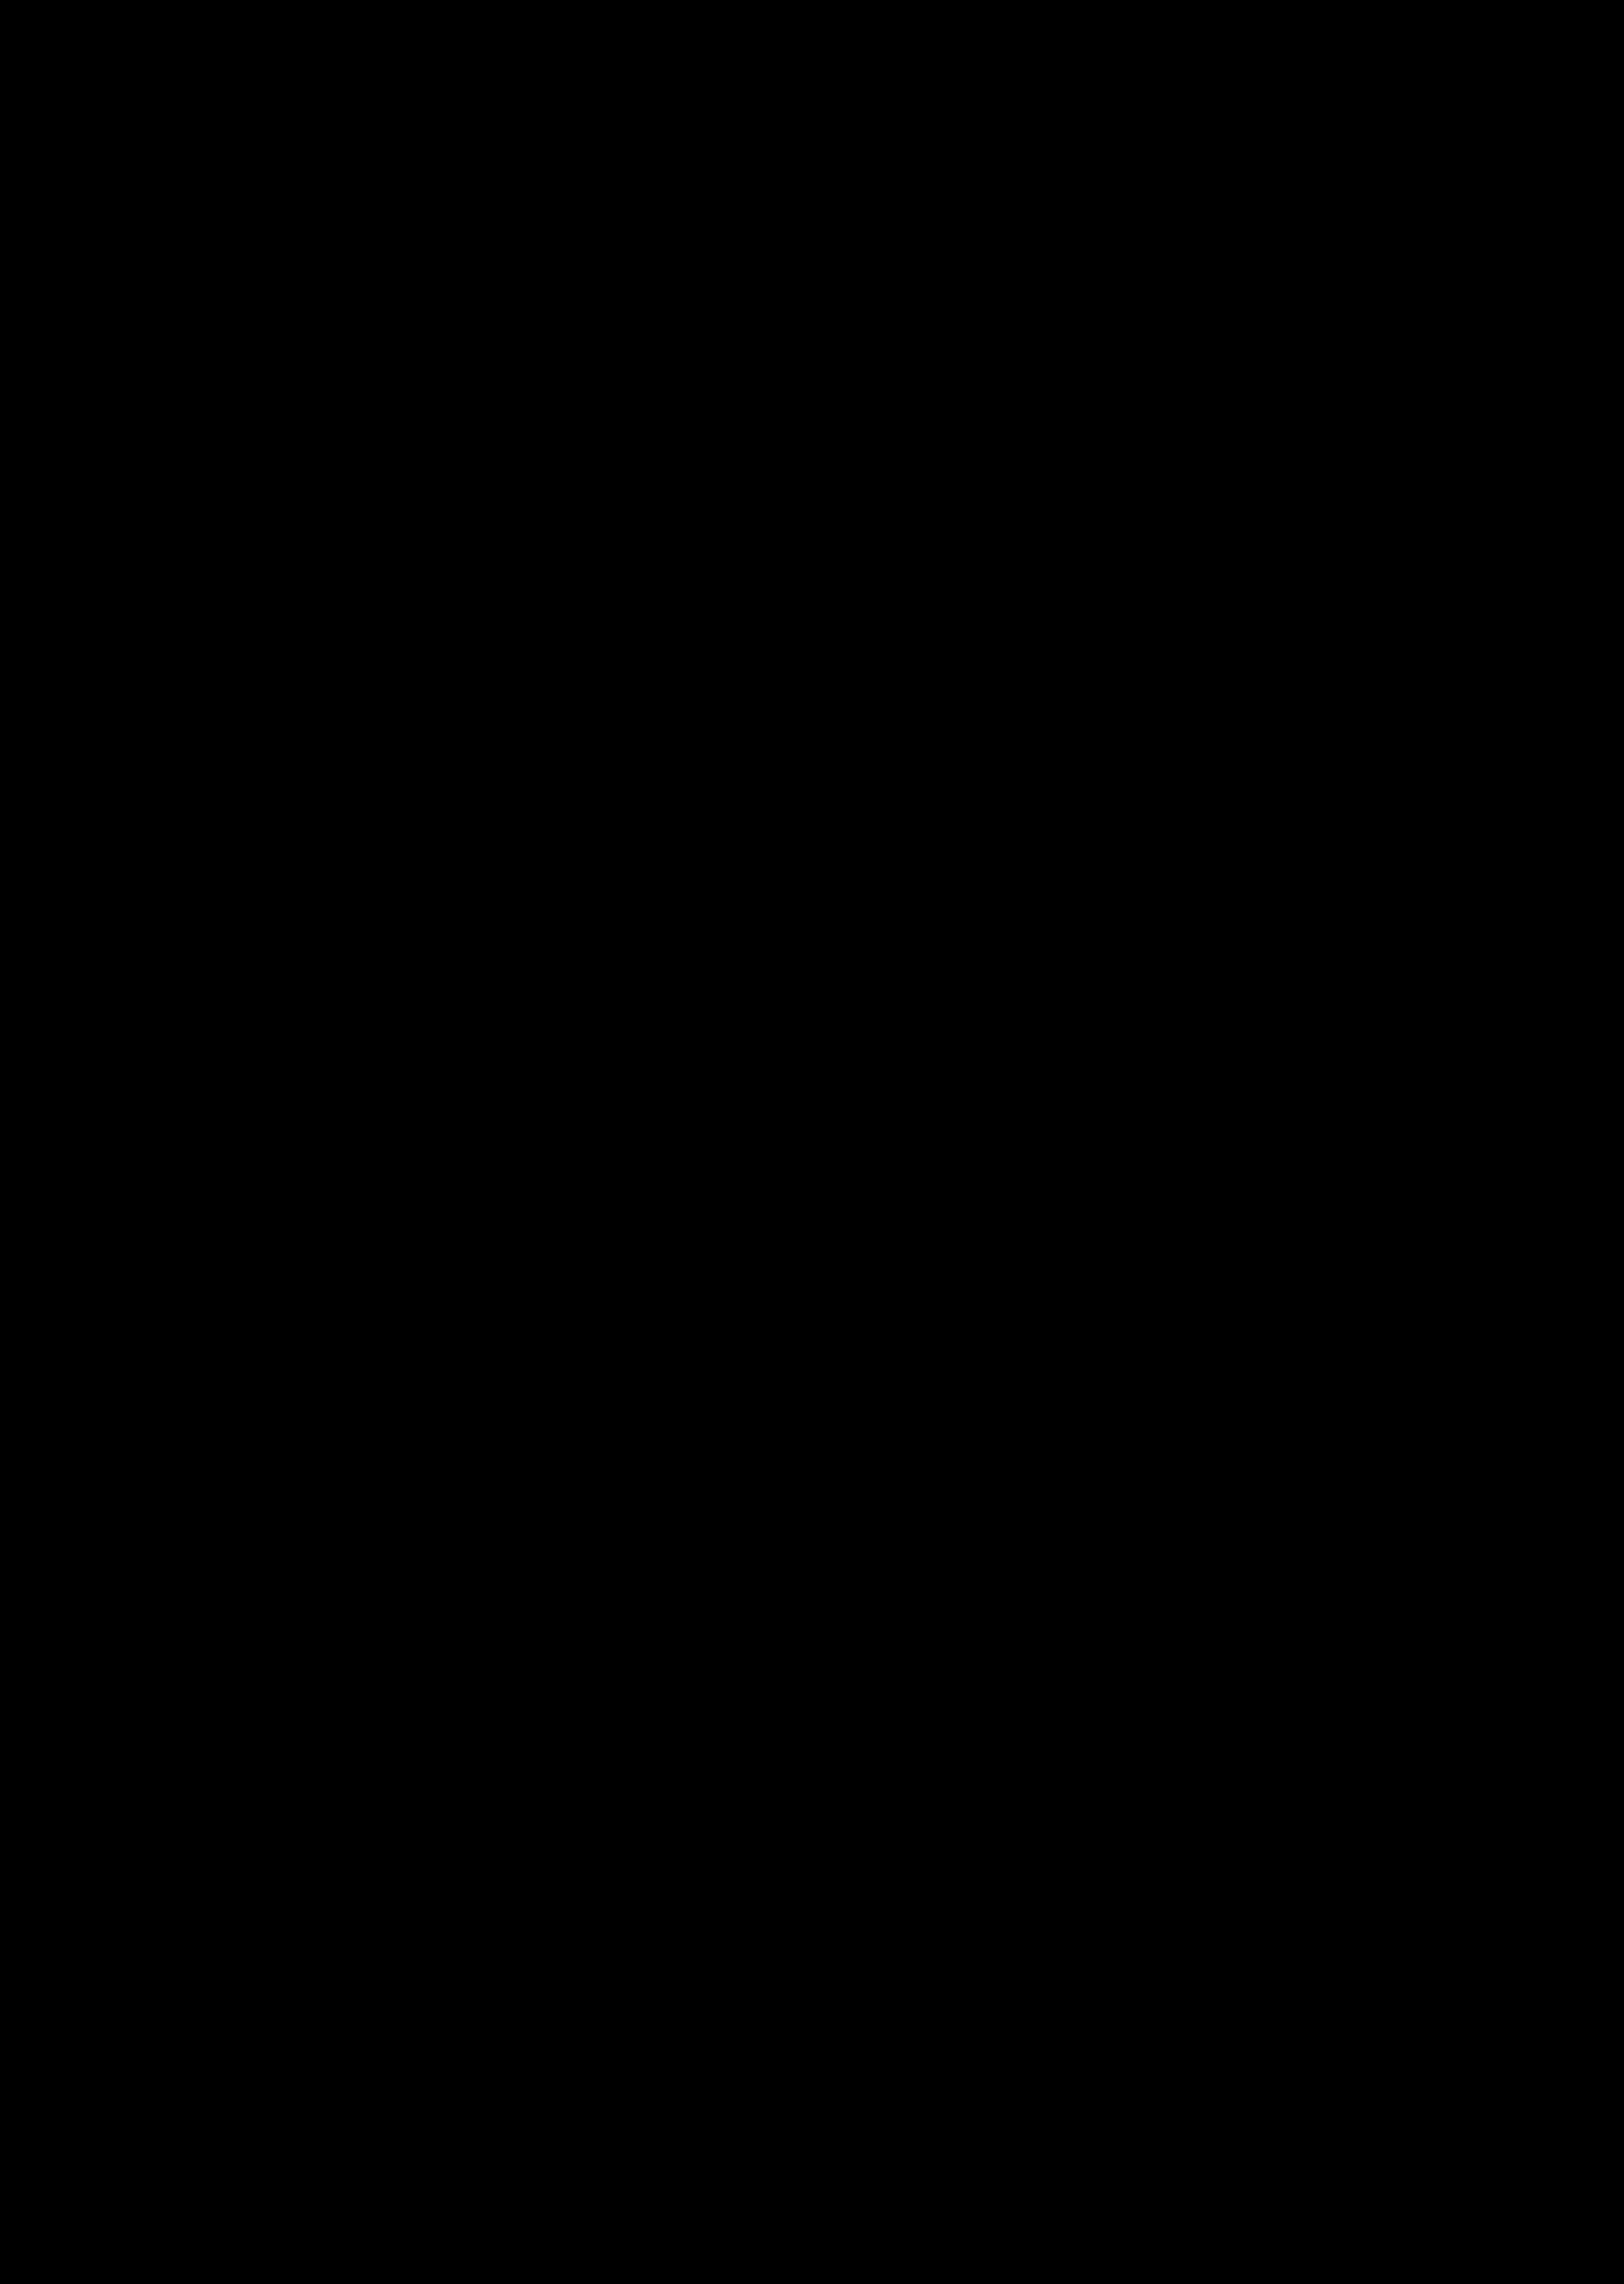 Tablet clipart white outline